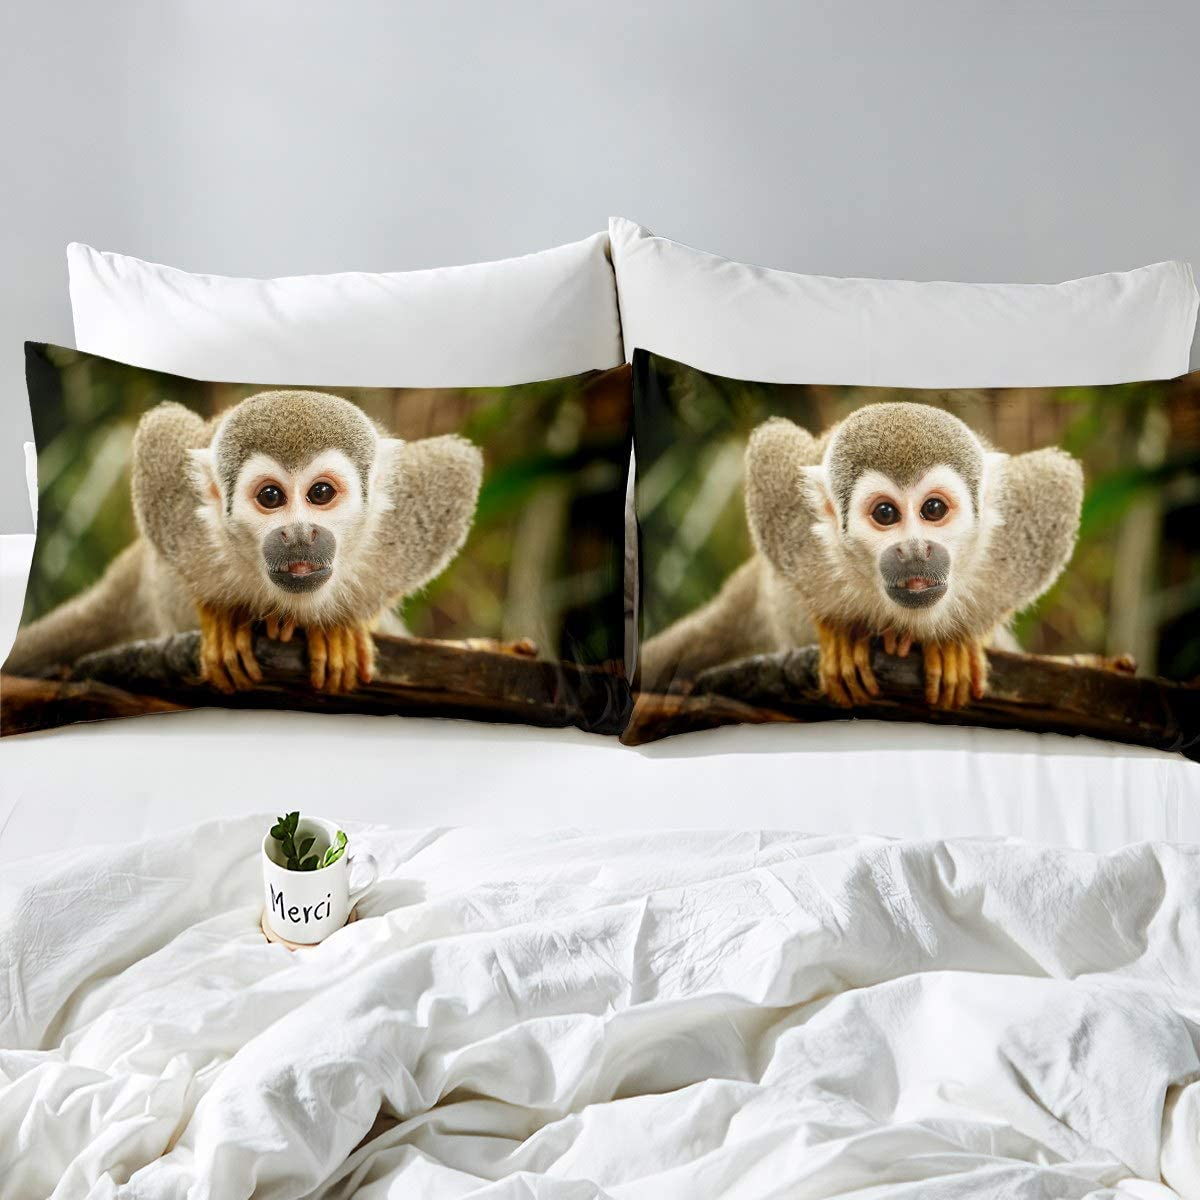 Feelyou Llama Alpaca Fitted Sheet Cute Llama Bedding Set Cartoon Llama Alpaca Design Bed Sheet Set for Boys Girls Children Teens Animal Theme Bed Cover Bedroom Decor Twin Size with 1 Pillow Case